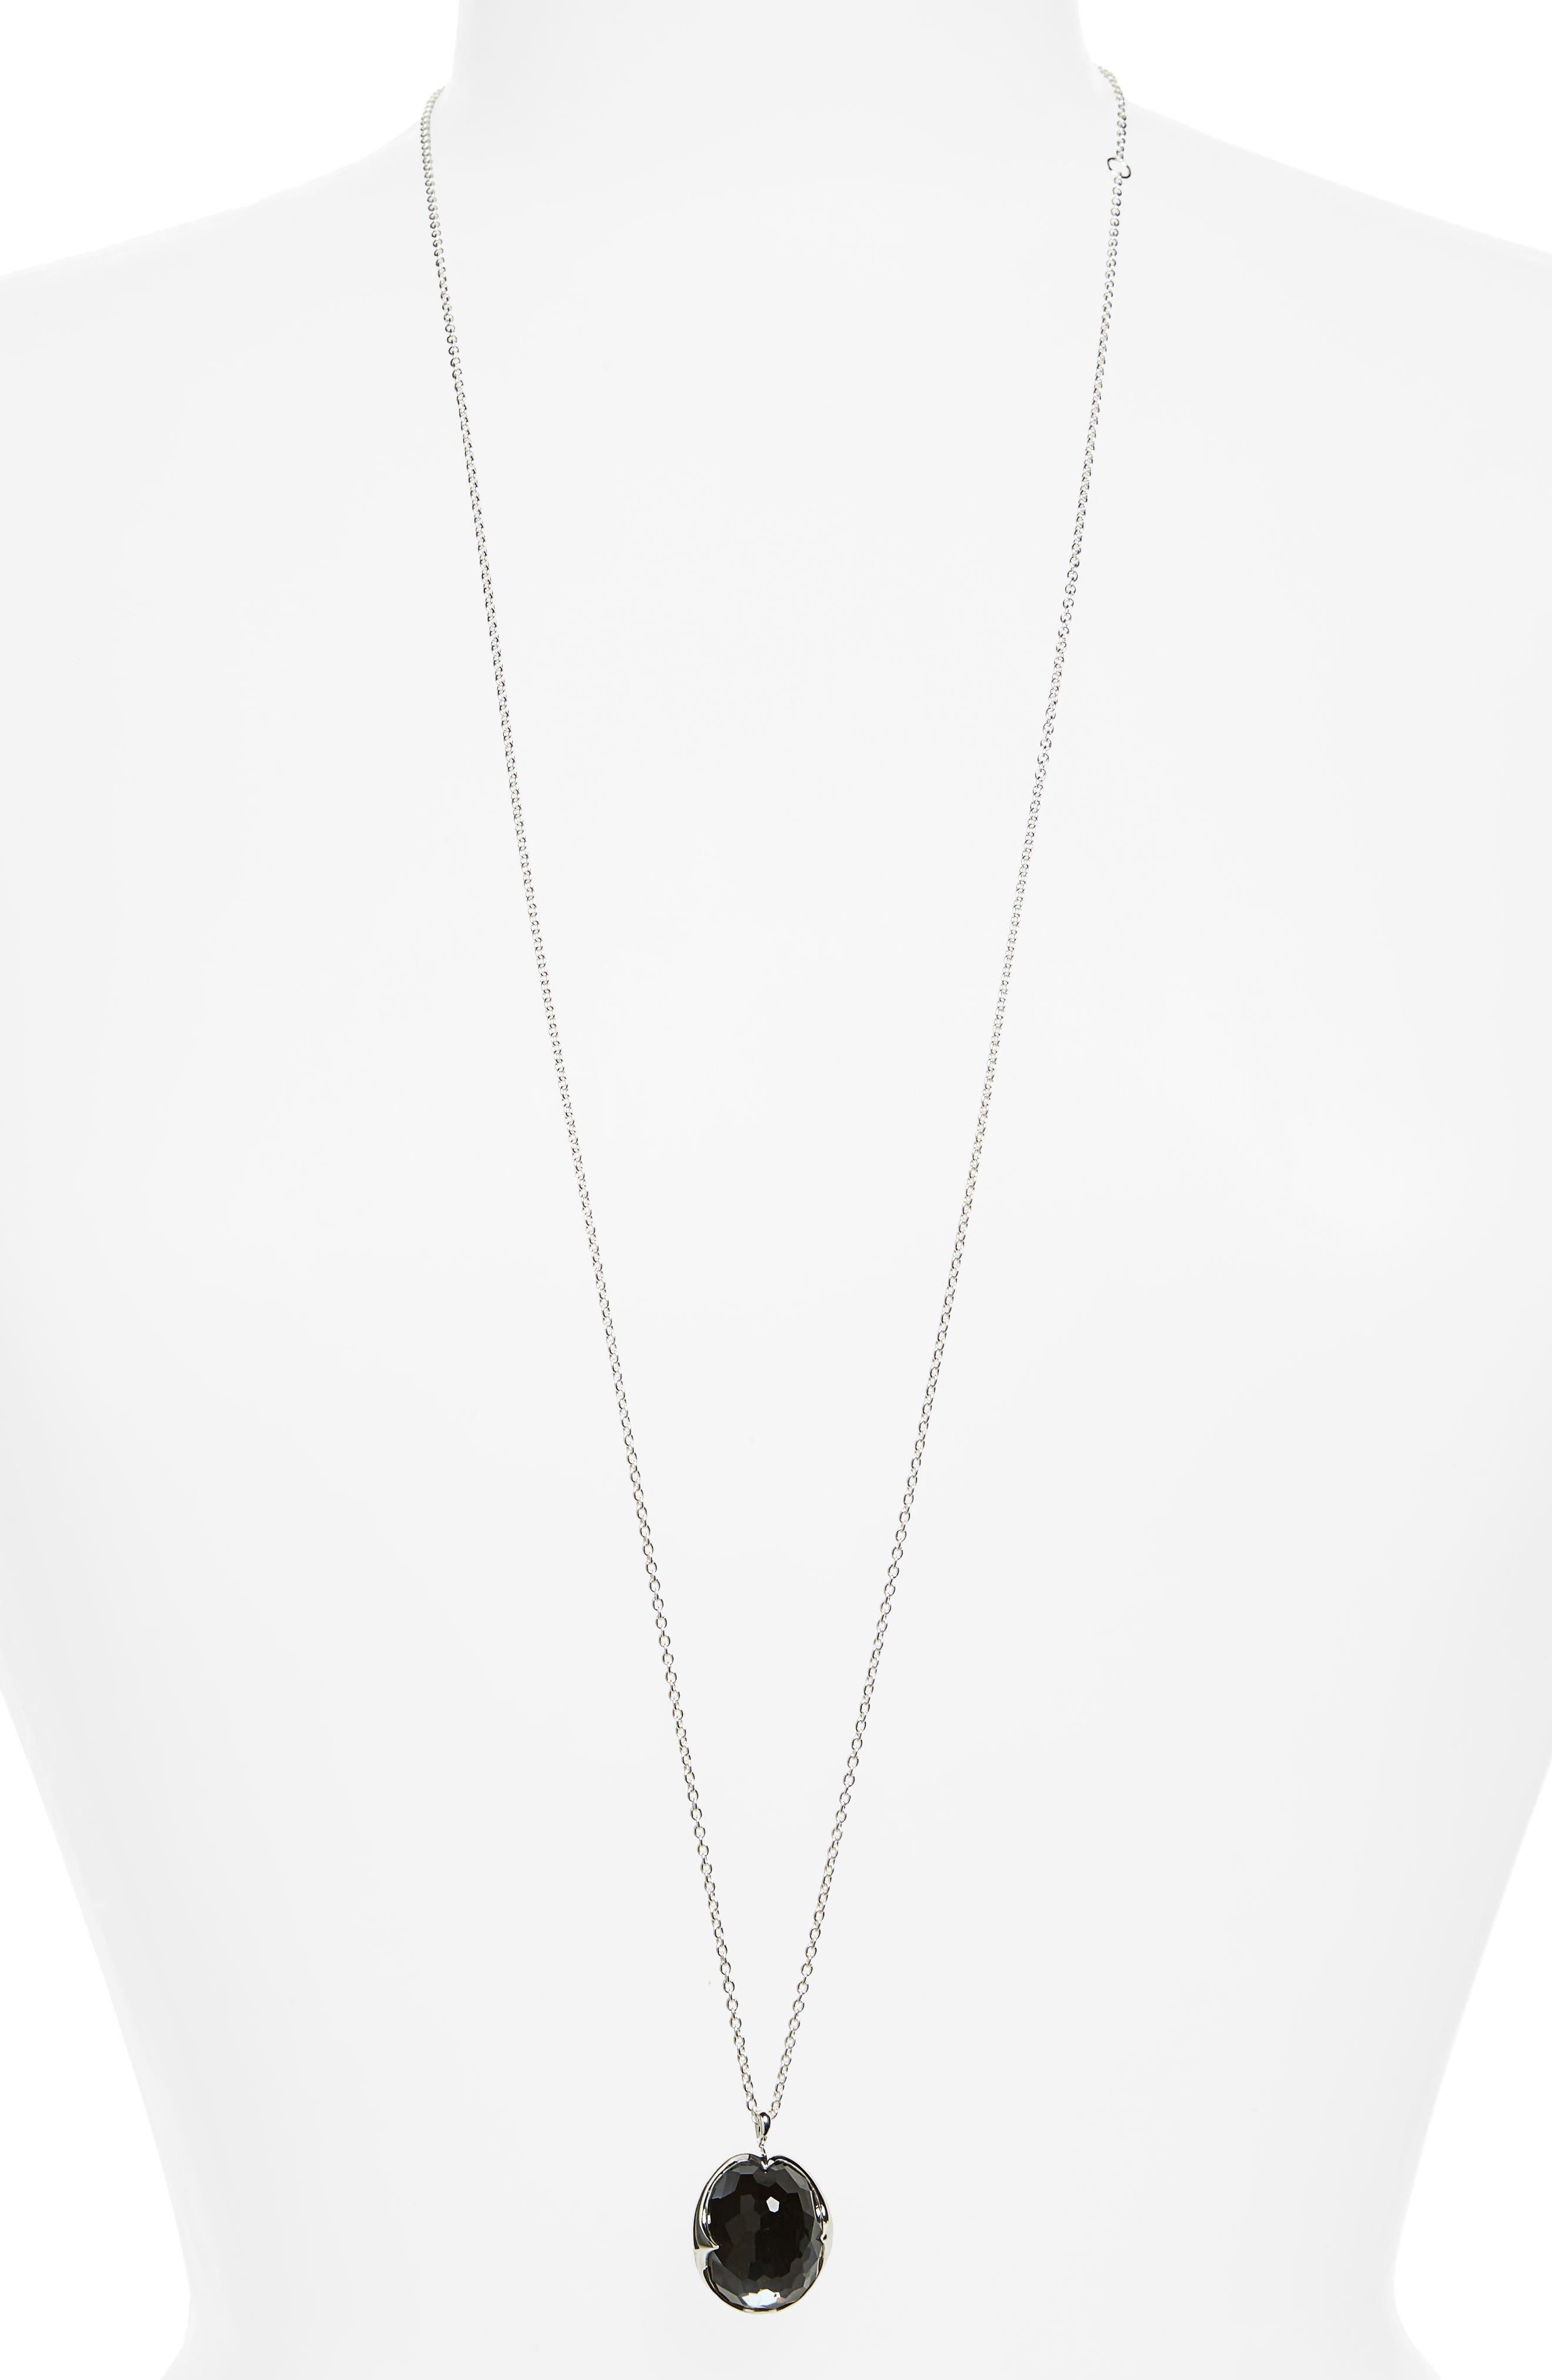 Rock Candy Long Pendant Necklace,                             Alternate thumbnail 2, color,                             SILVER